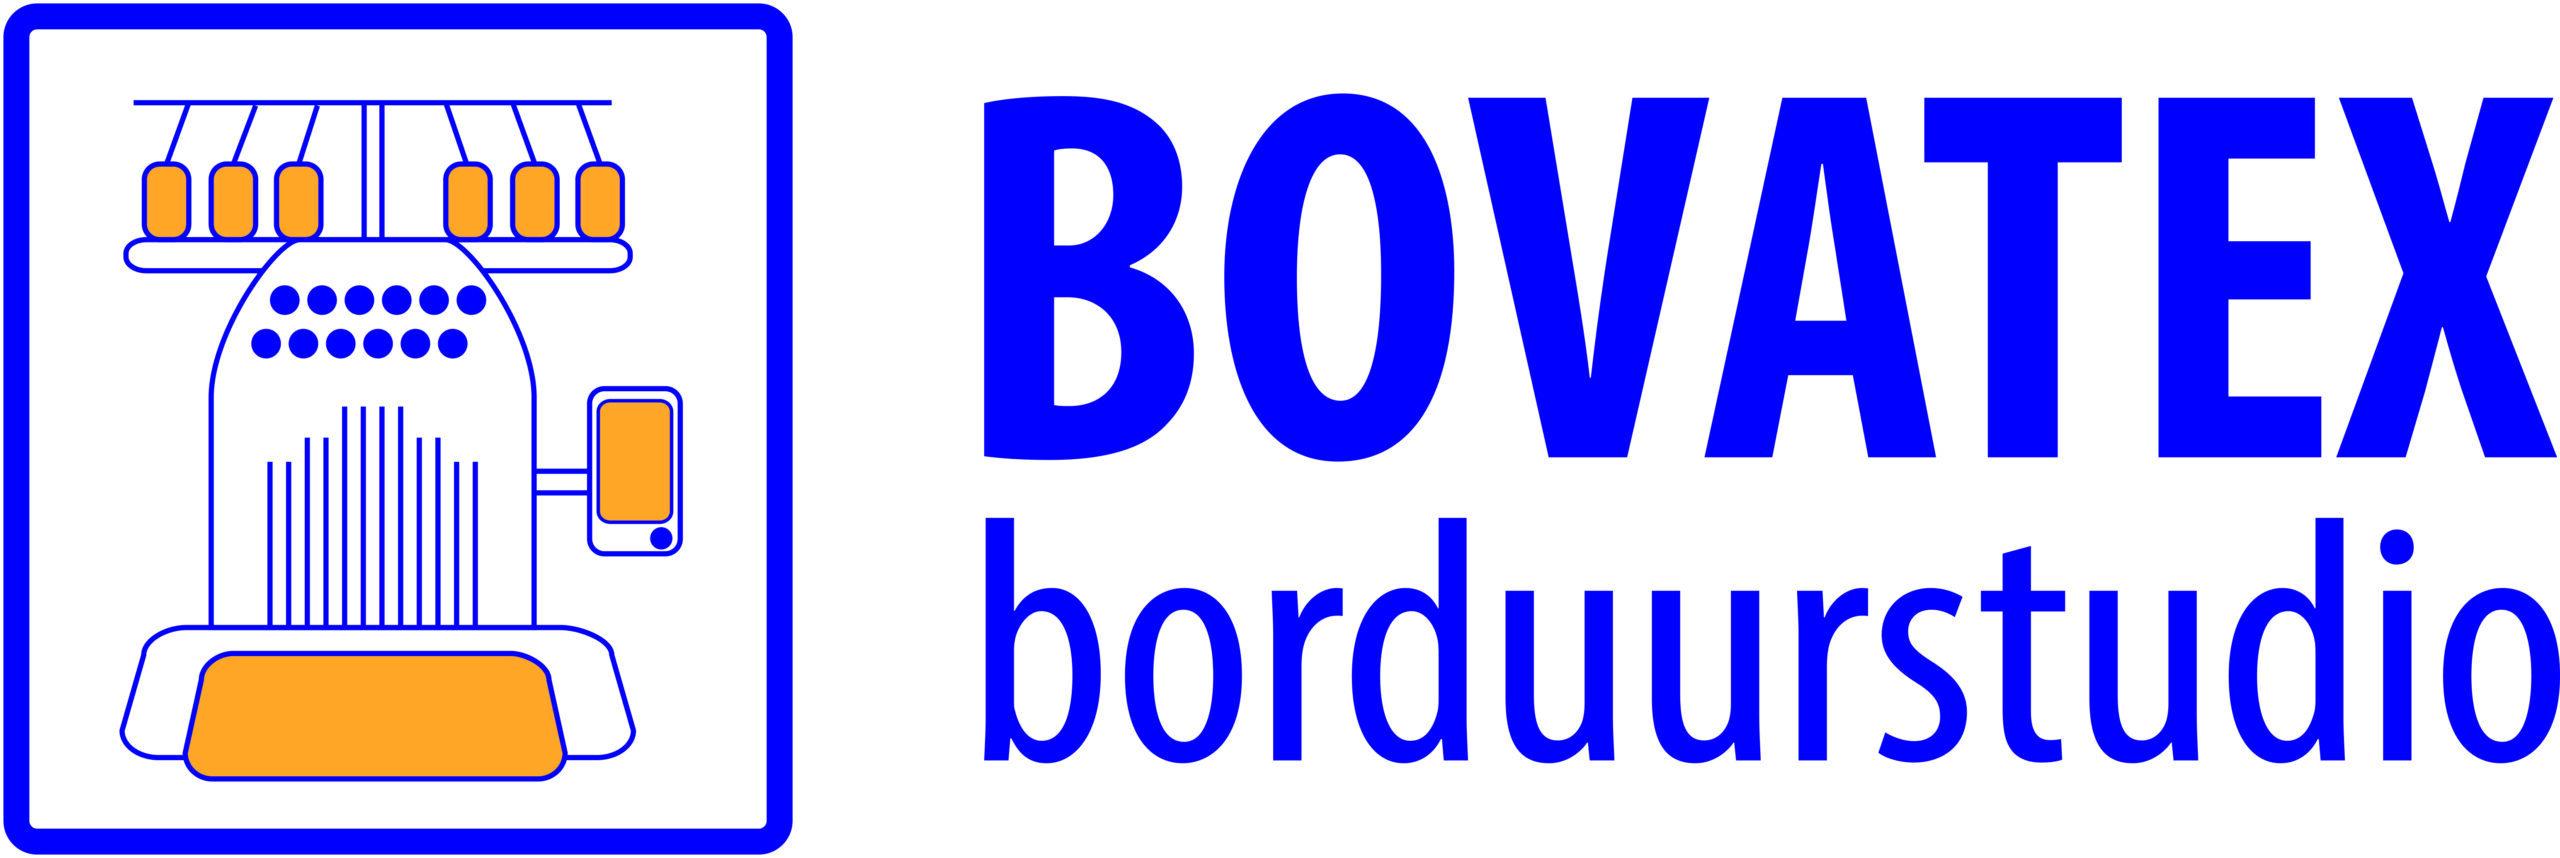 Bovatex